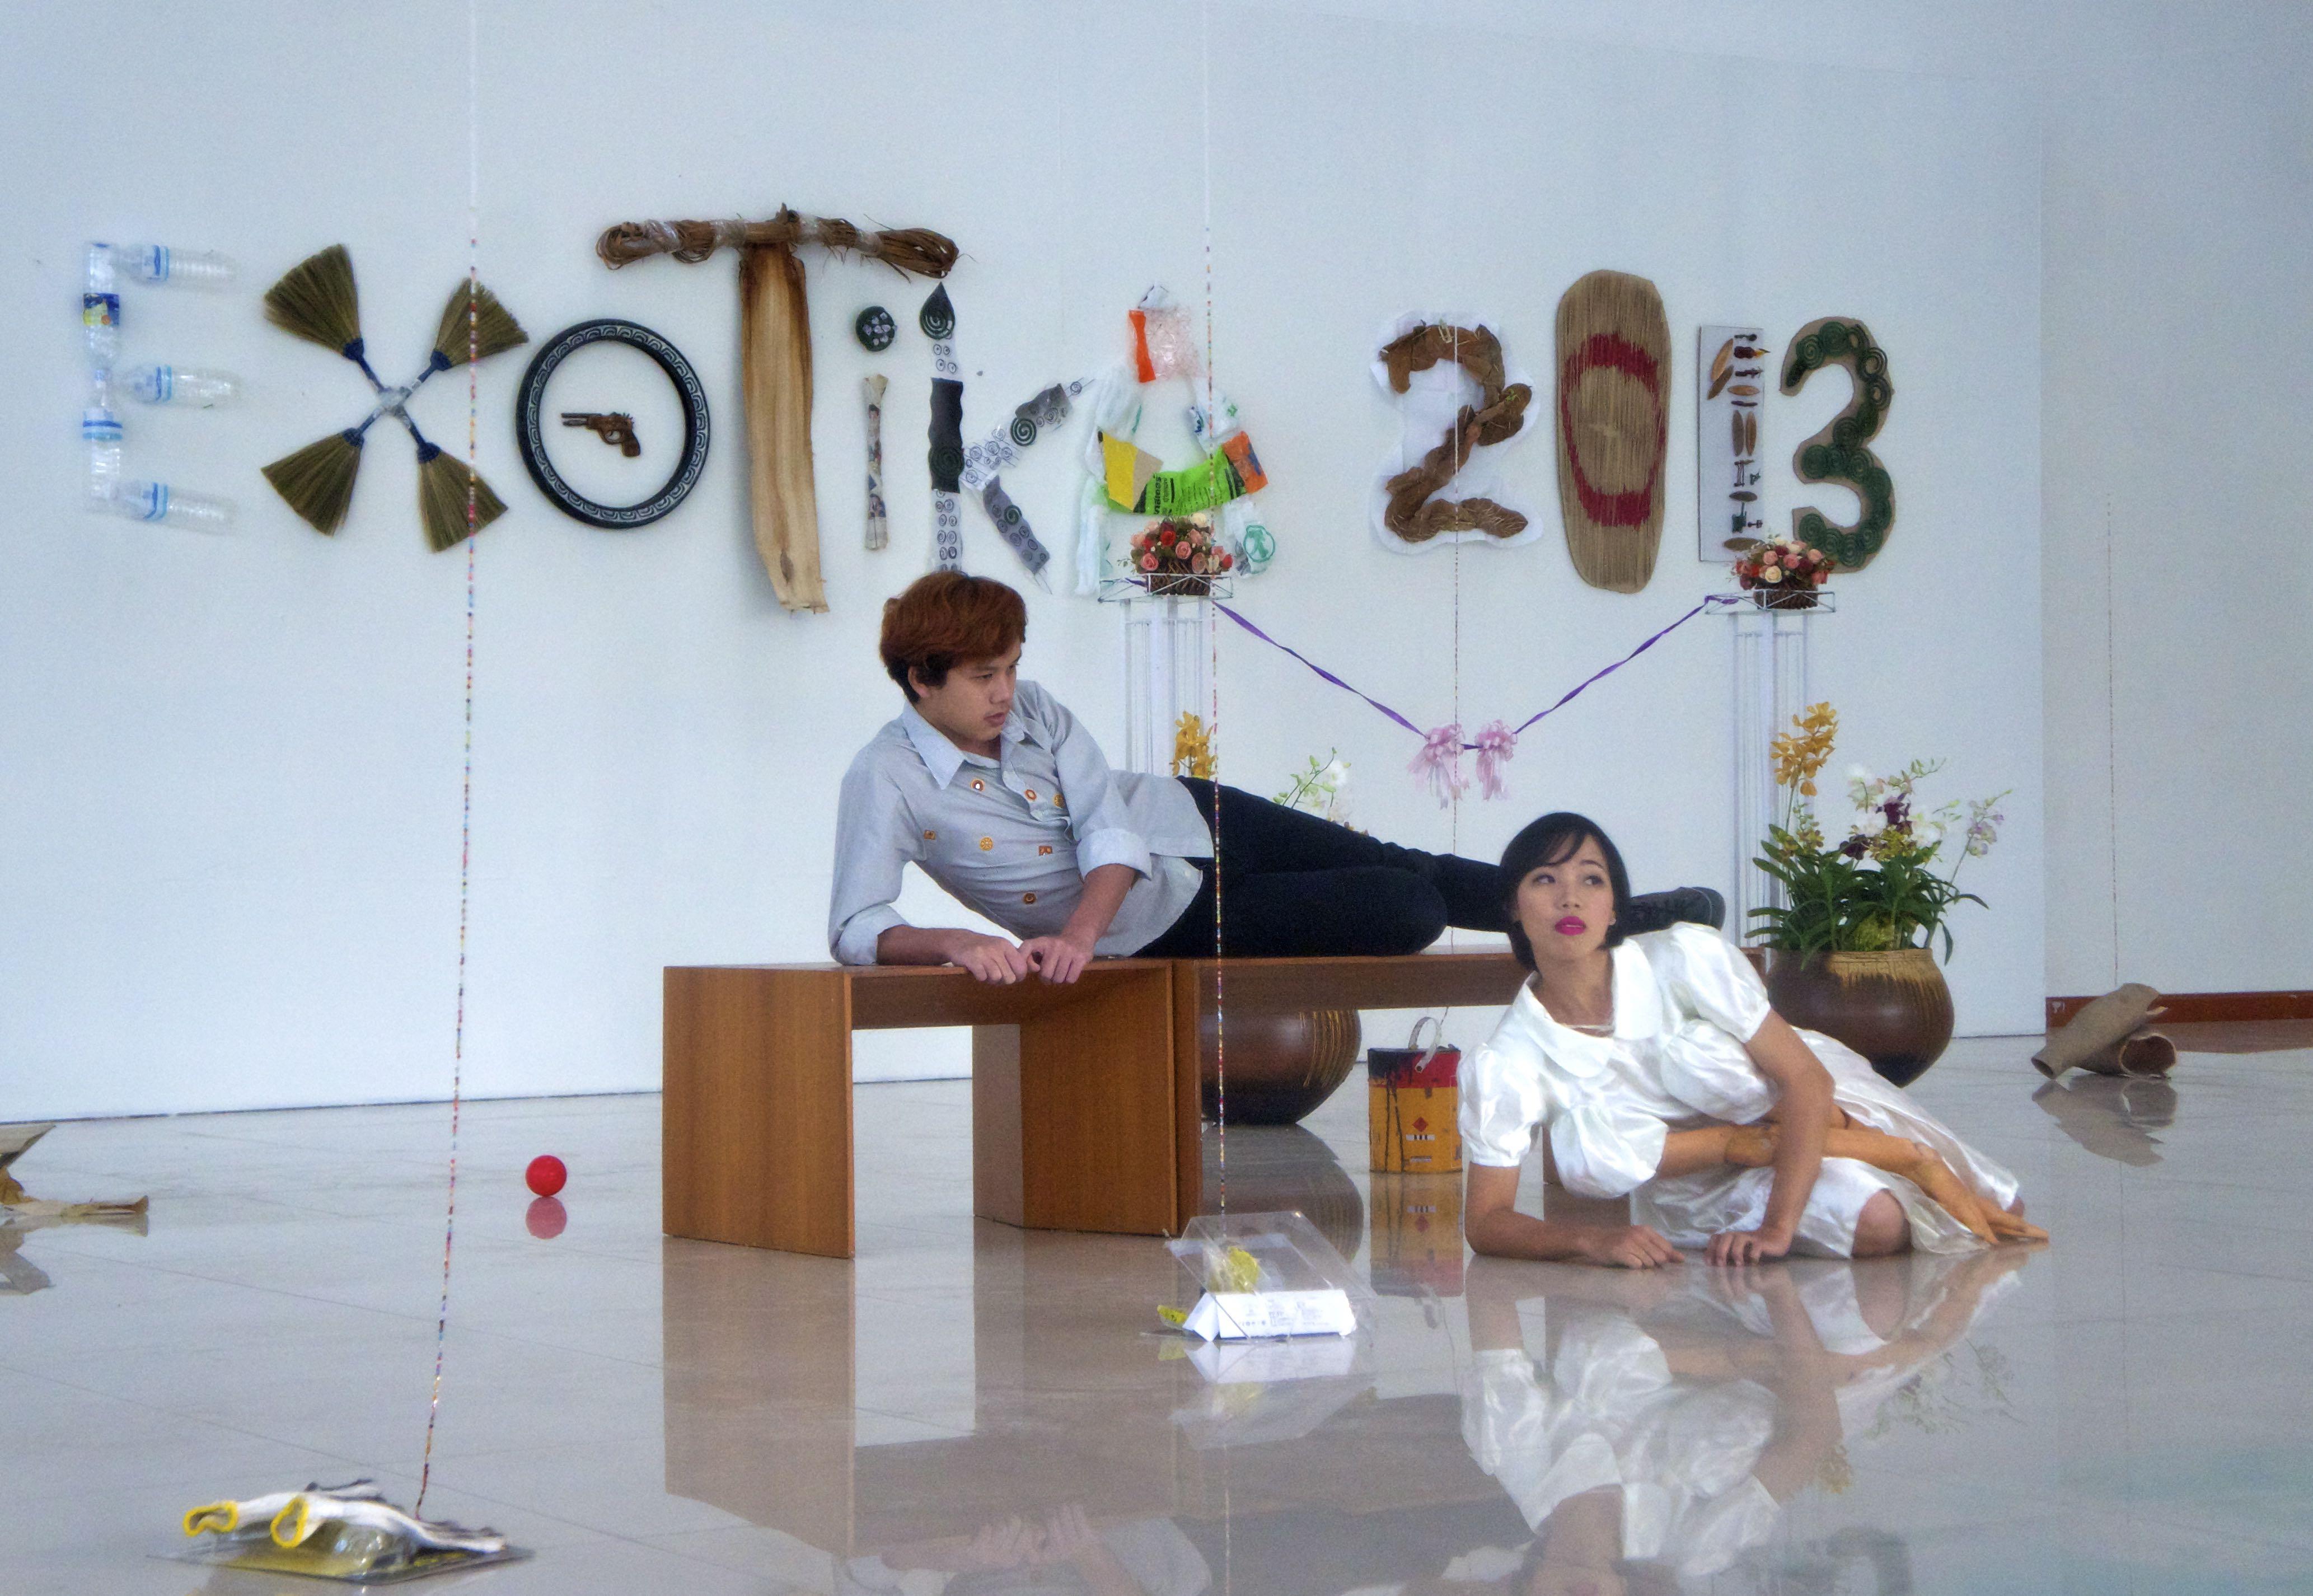 Exotika 2013- Performance Opening event,Silapakorn Art Lab Bangkok, Thailand